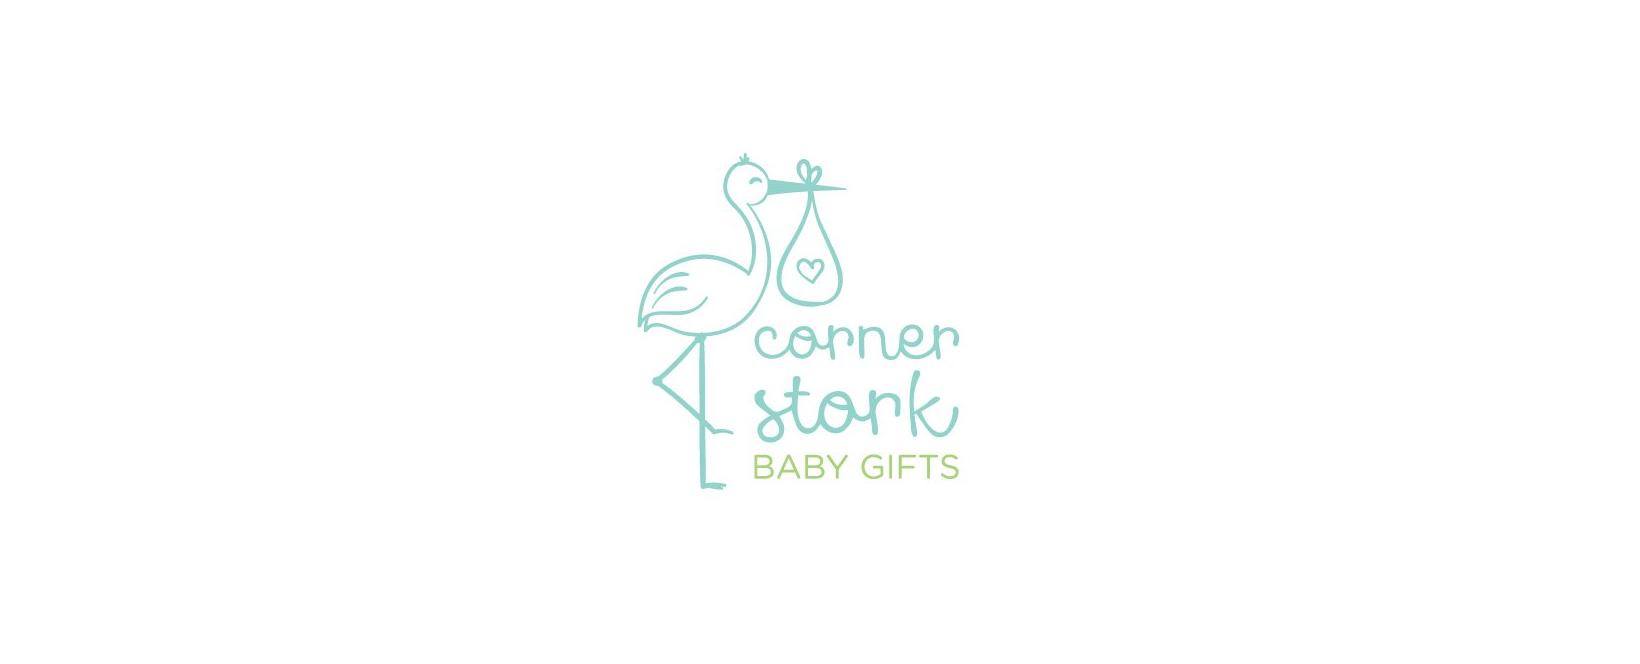 Corner Stork Baby Gifts Coupon Code 2021